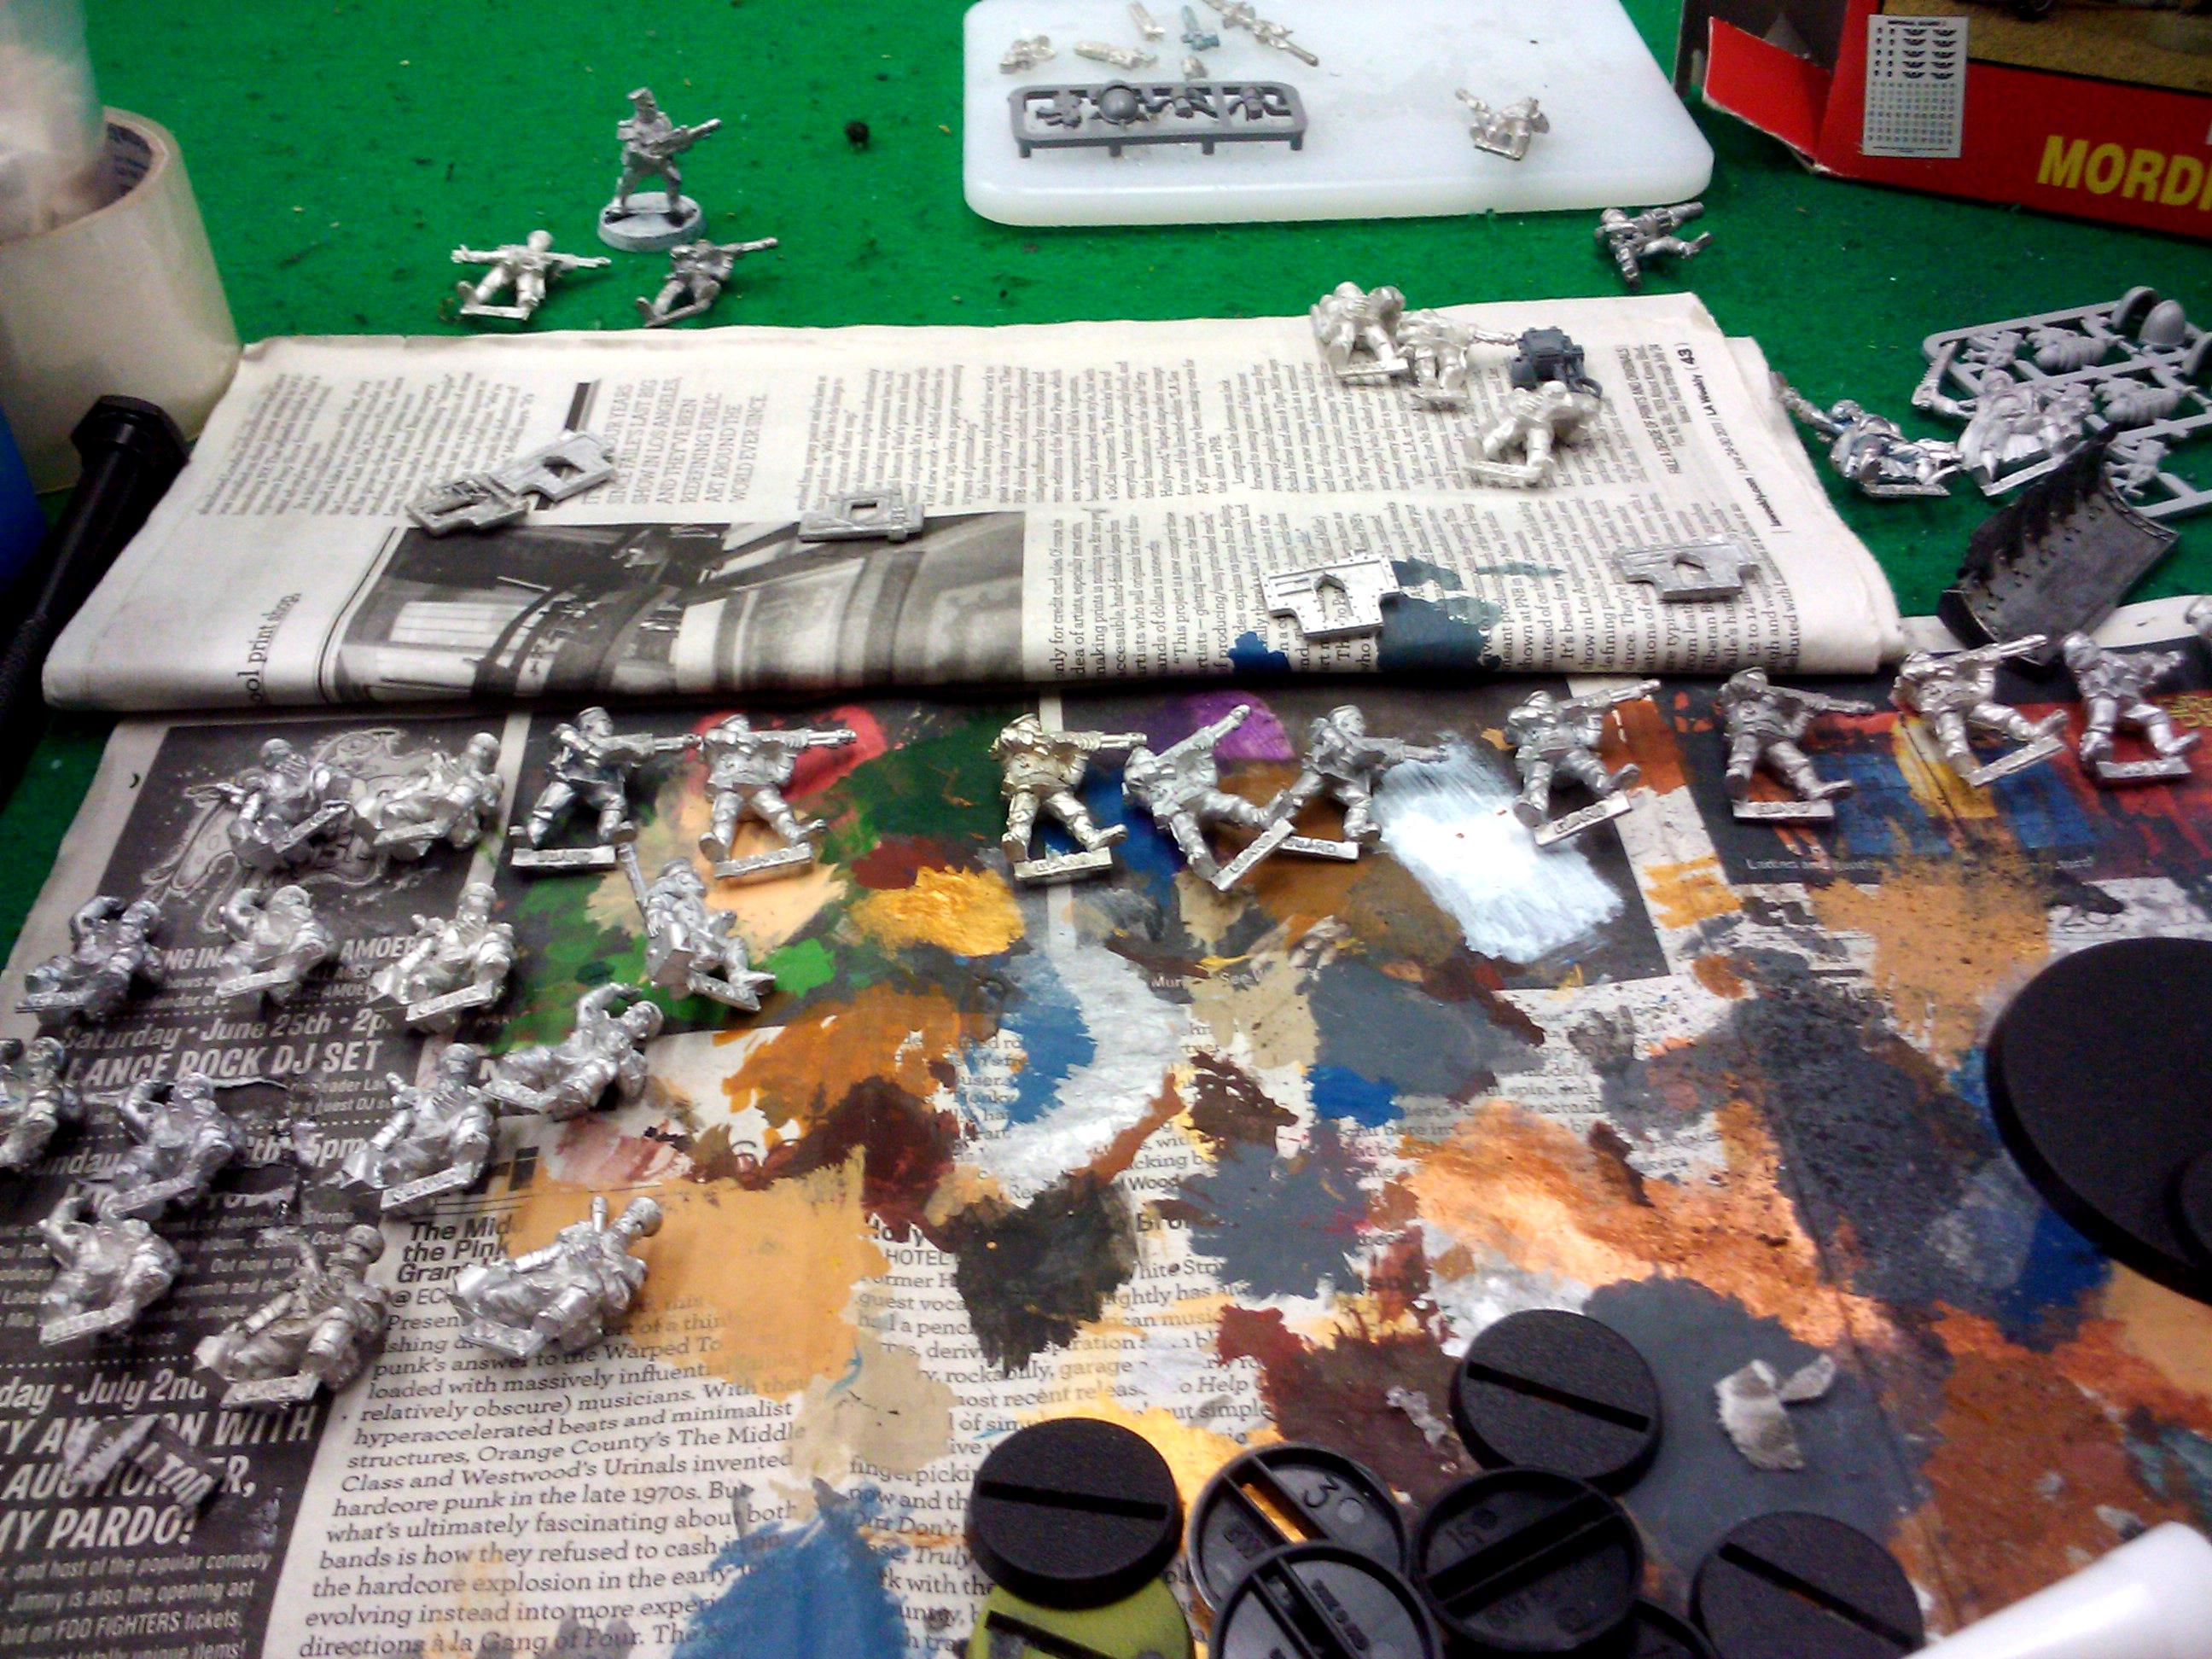 Games Workshop, Imperial Guard, Mordian, Mordian Iron Guard, Warhammer 40,000